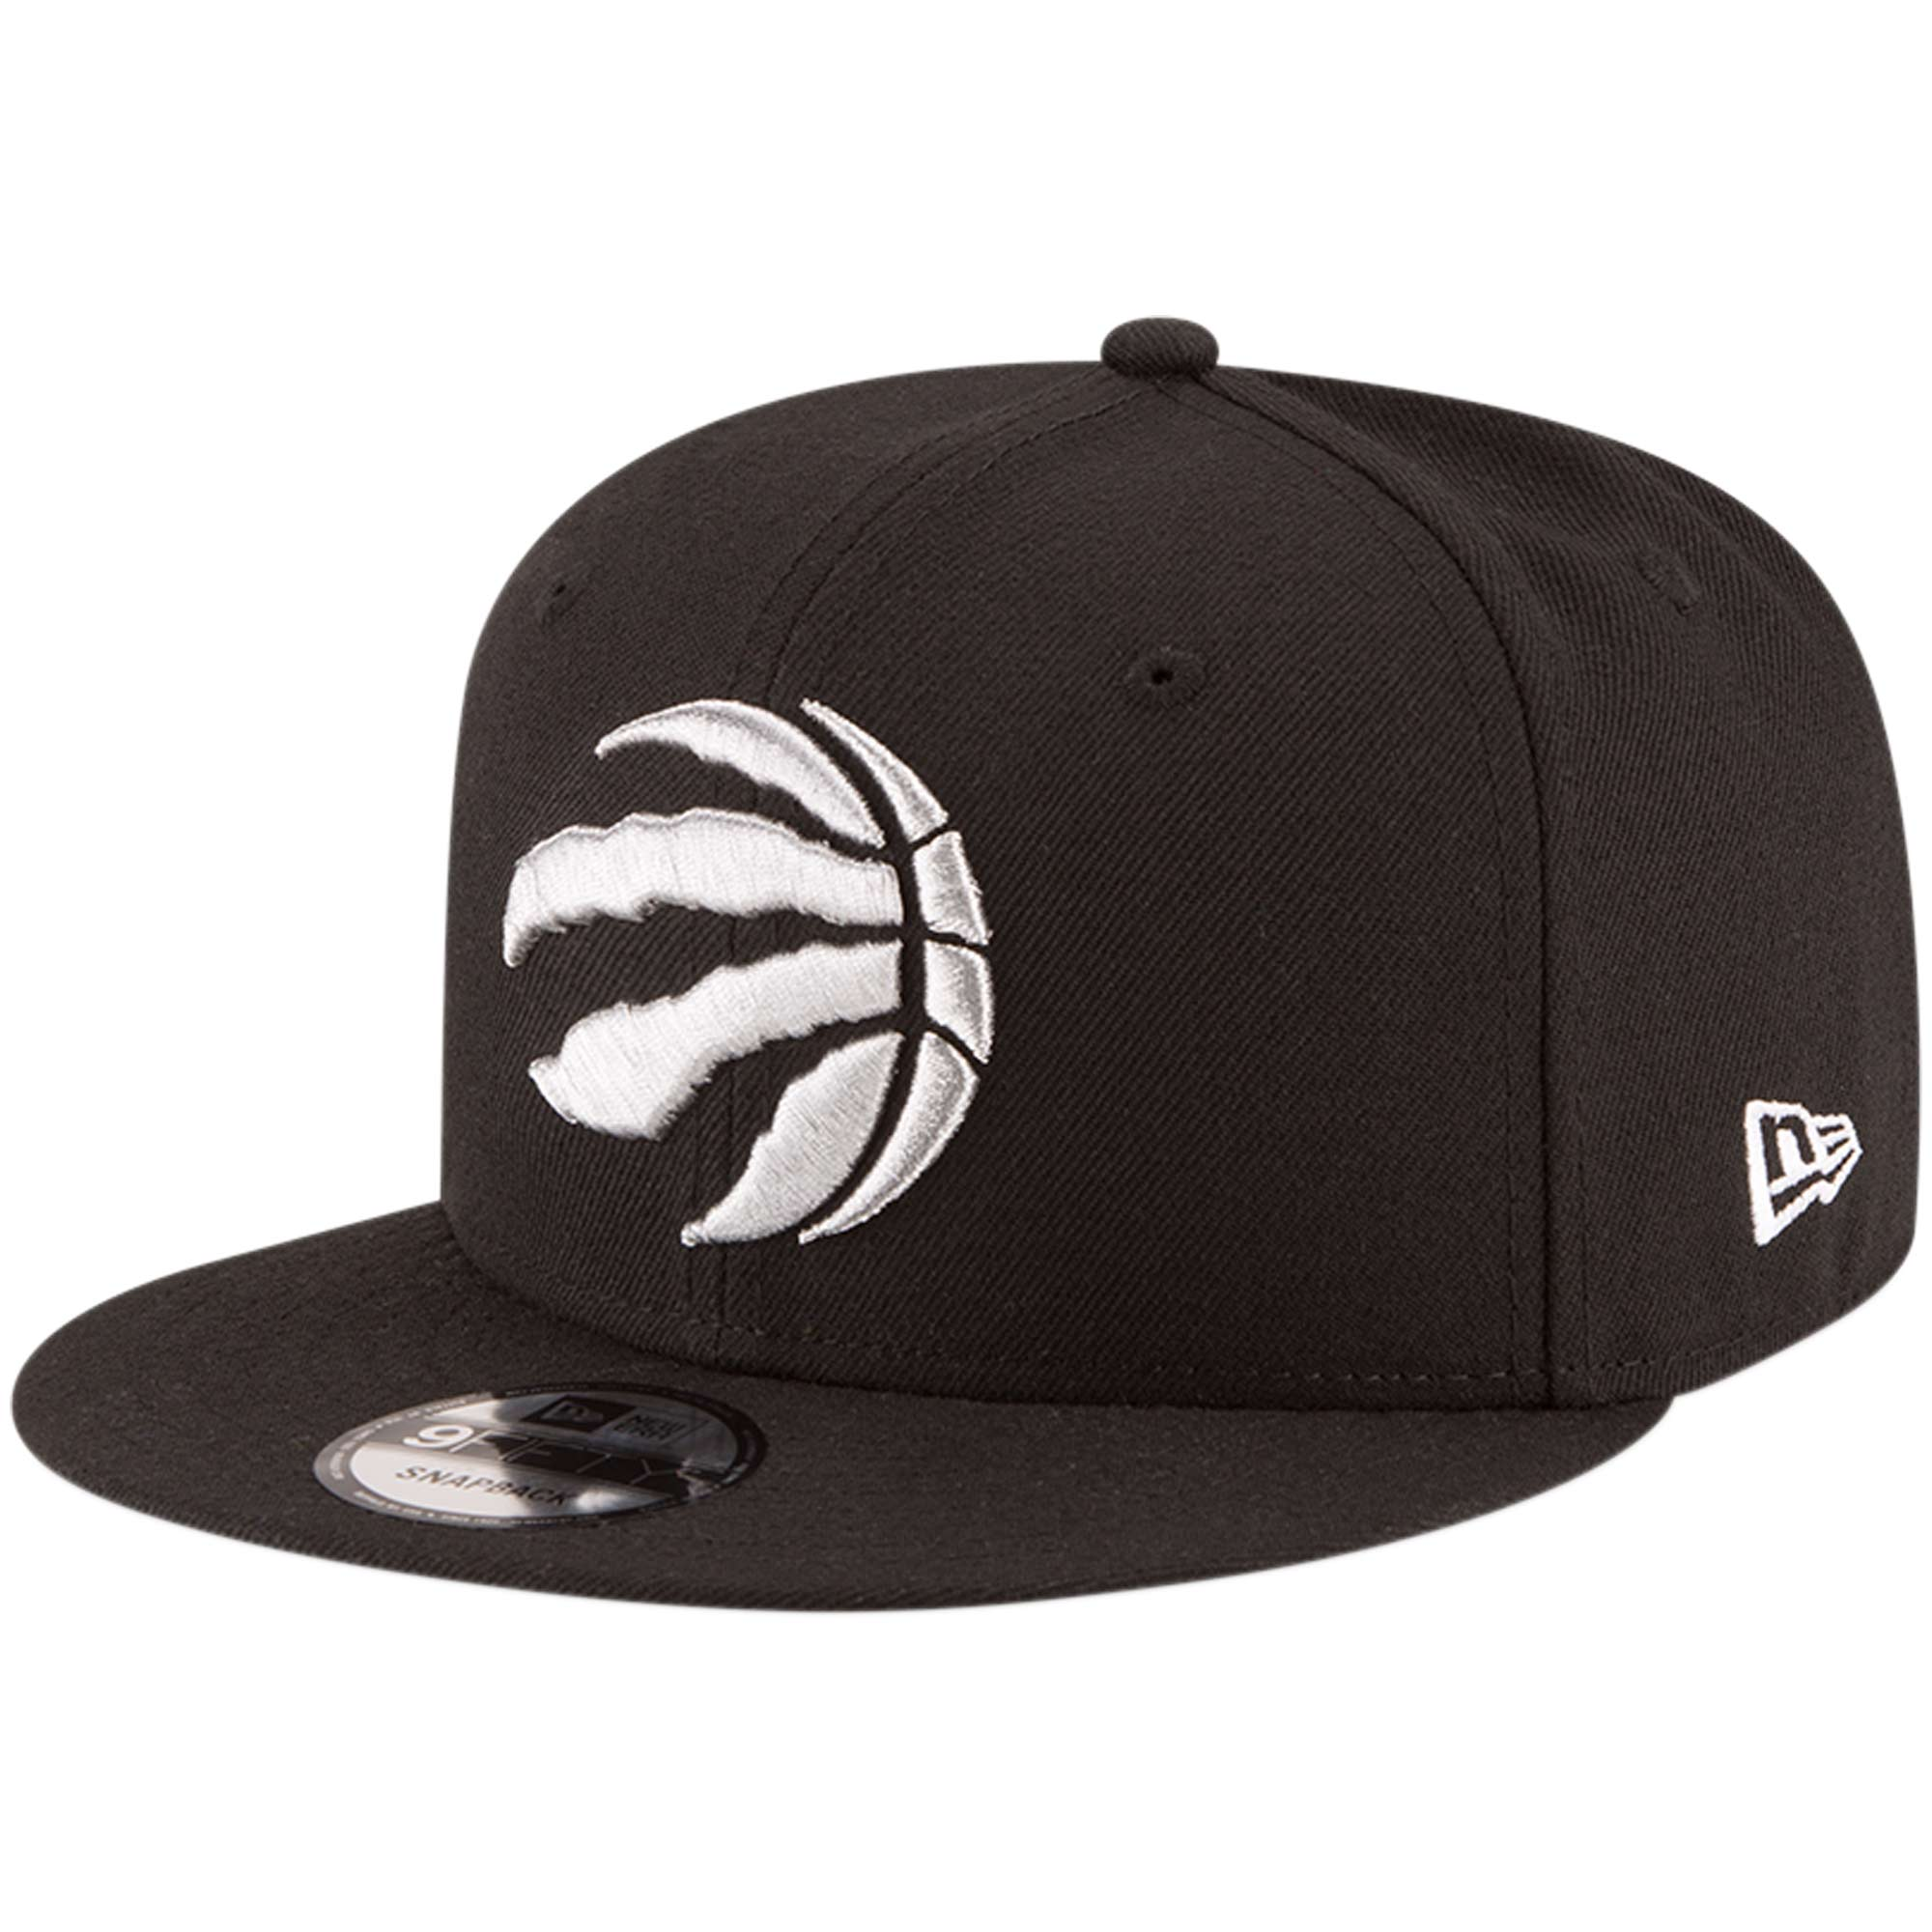 Toronto Raptors New Era Official Team Color 9FIFTY Adjustable Snapback Hat - Black